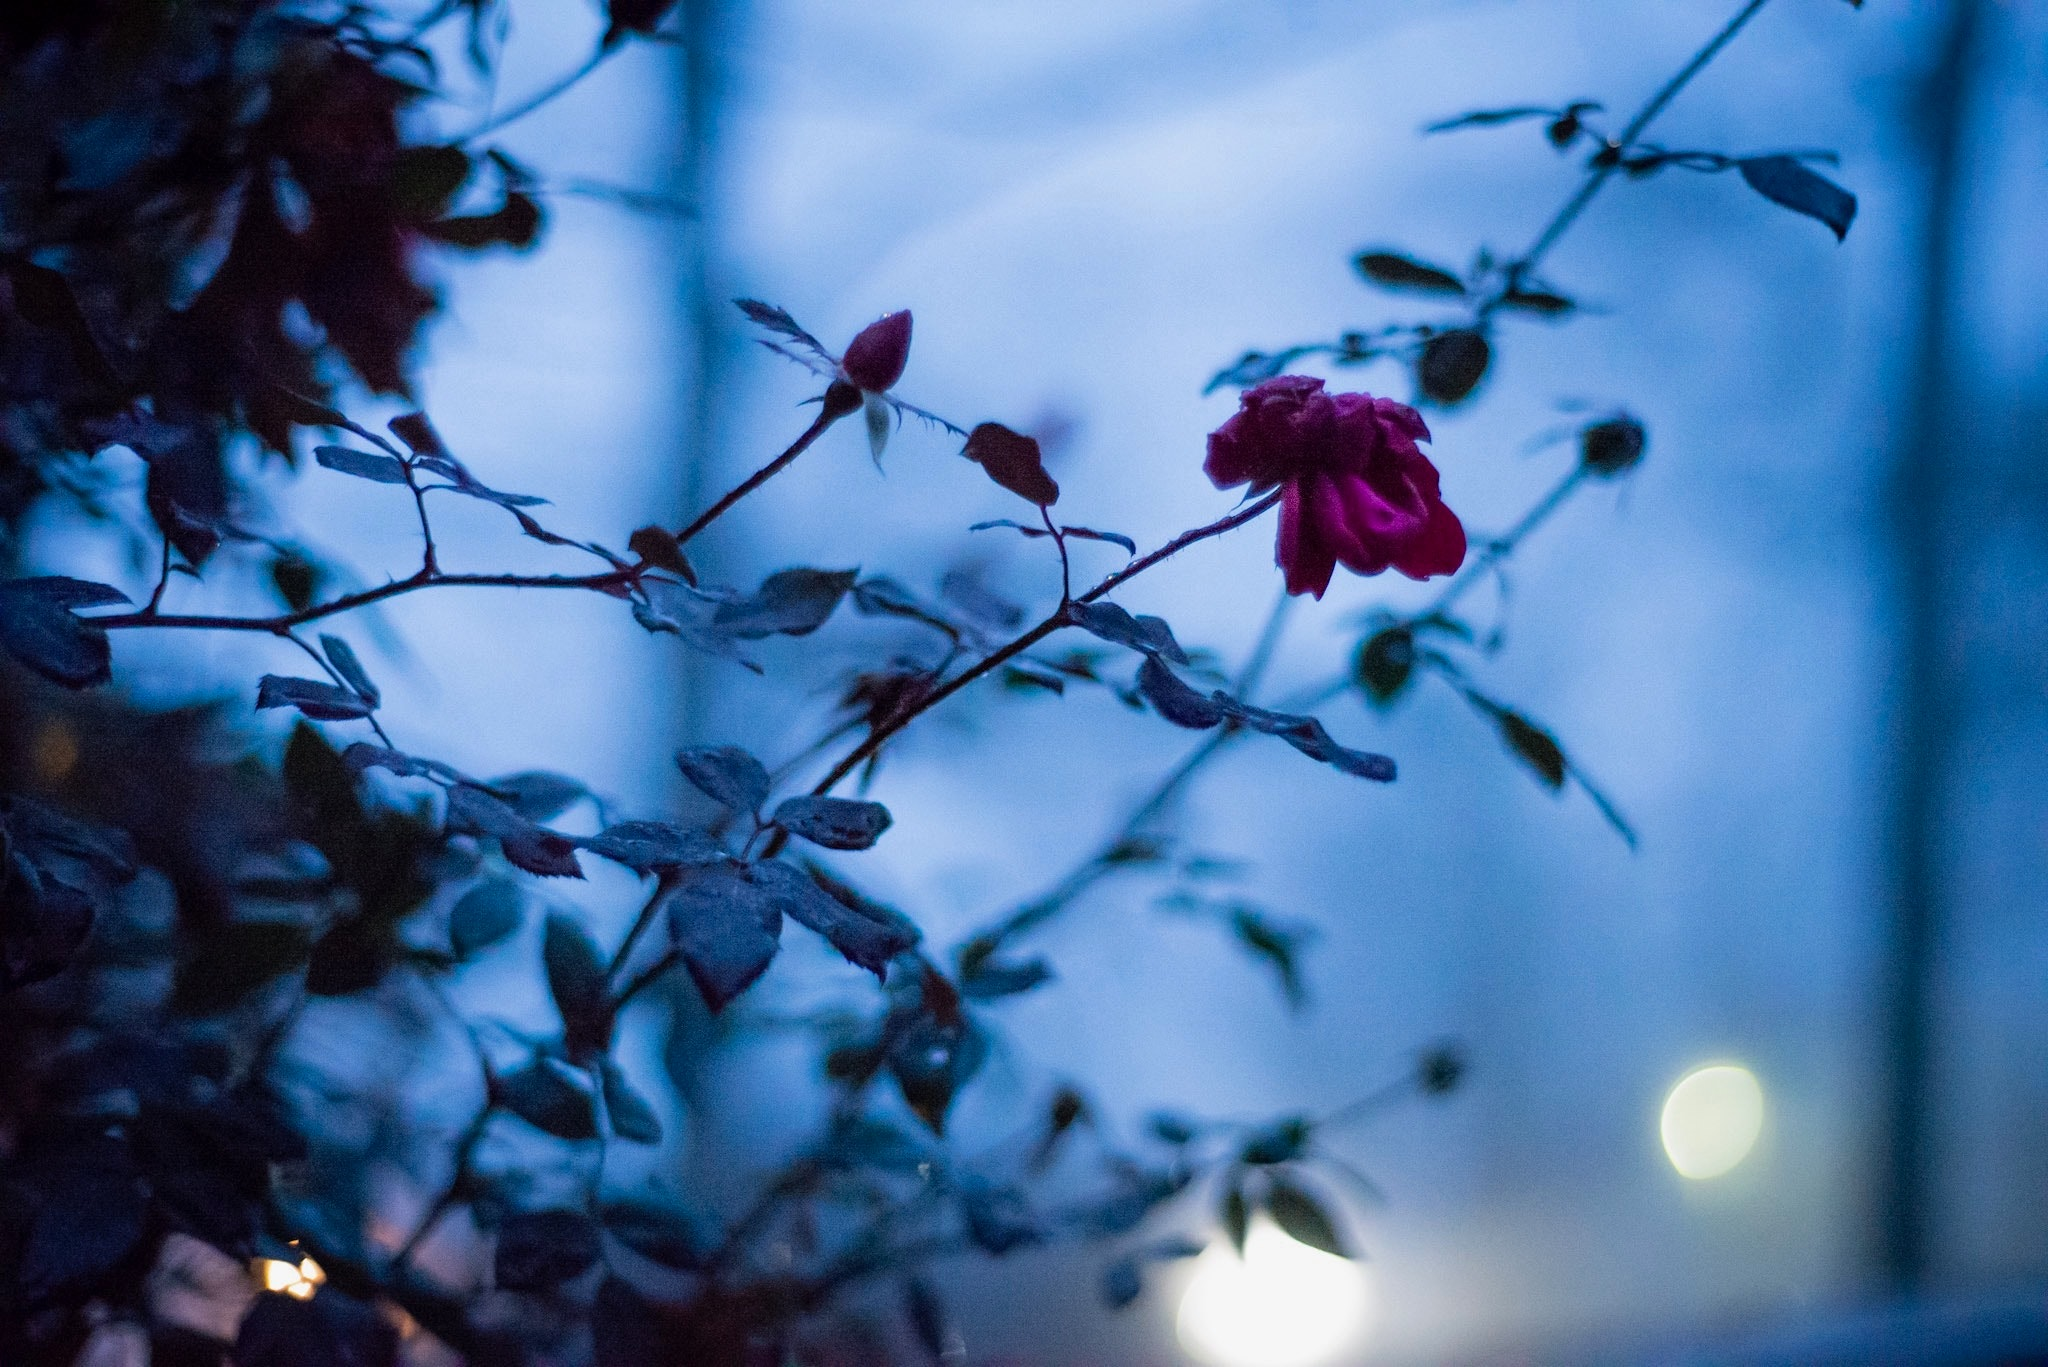 Fae Images - IMG_5066